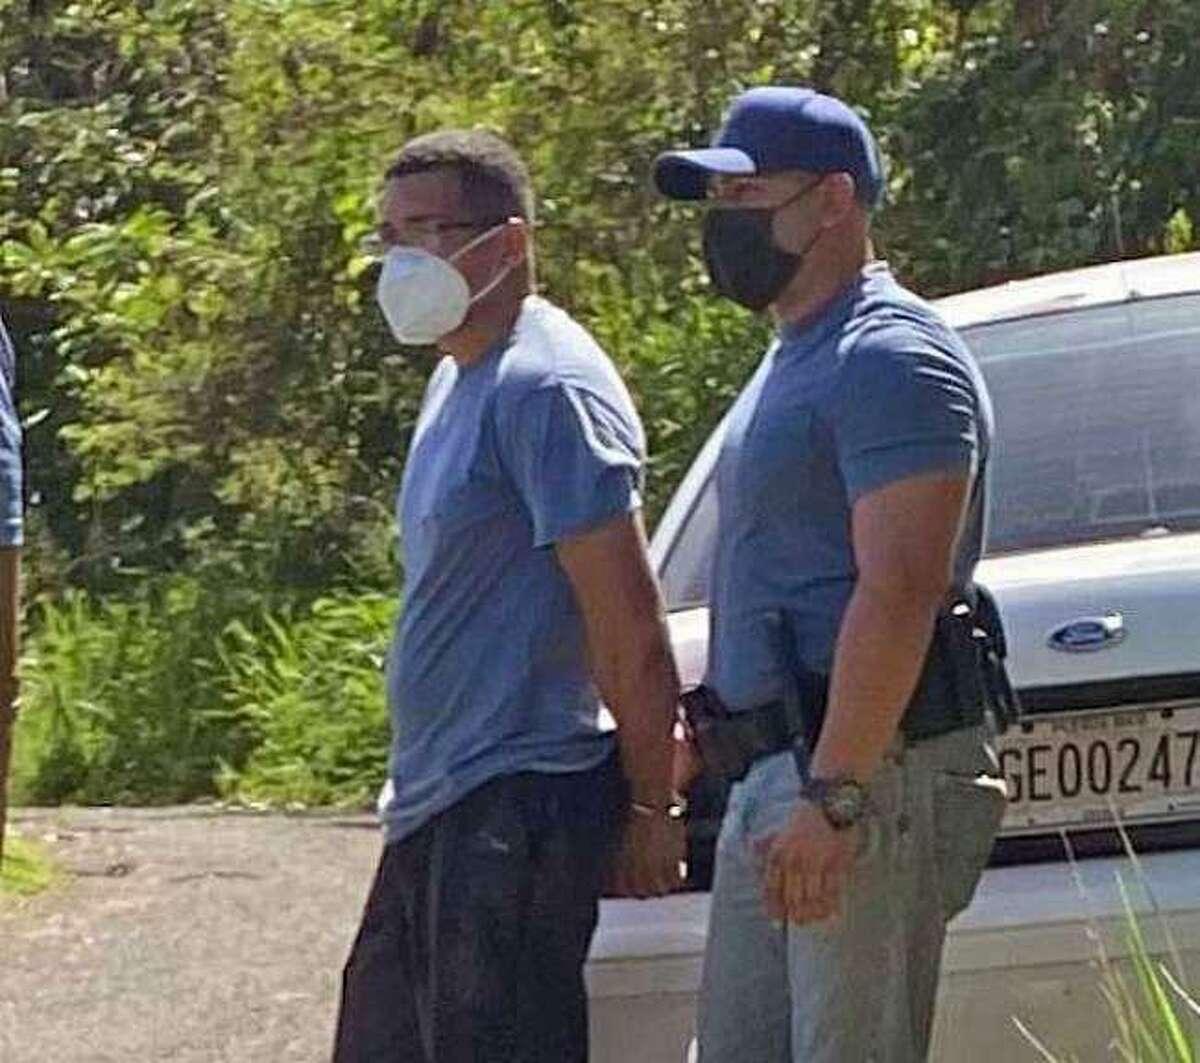 Davis Omar Roman Villanueva when he was taken into custody in Puerto Rico in October in connection with a Meriden, Conn., fatal shooting.